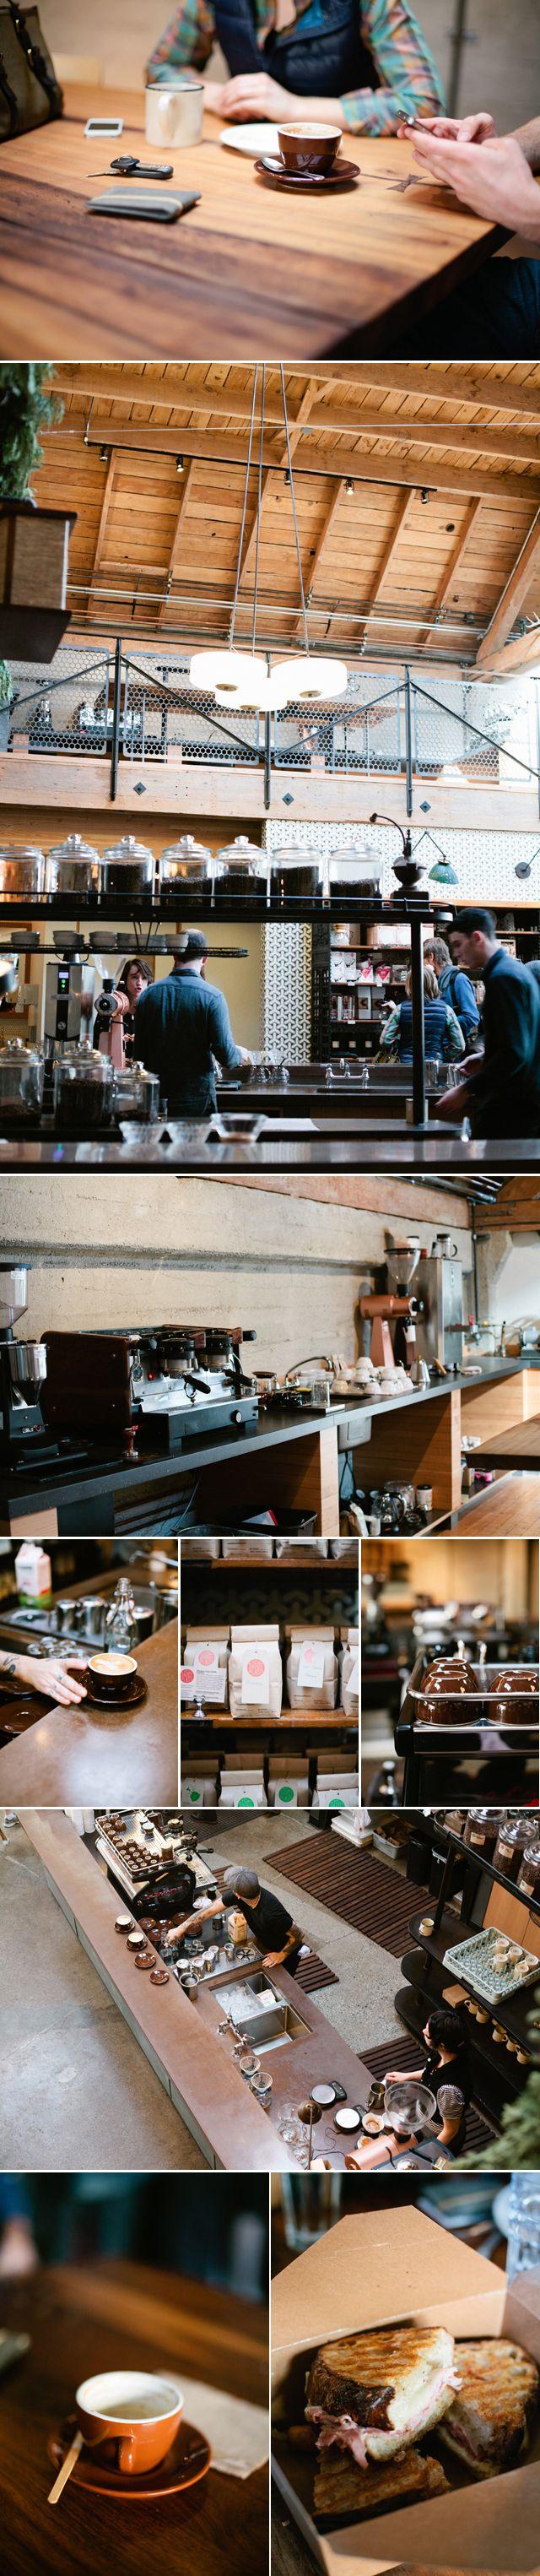 Sightglass Coffee: Cafe Coffee Shop Bar, Favorite Places, Cafe Restaurant, Cafe Bar, Café, Cafe 29, Cafe Design, Afternoon Quad